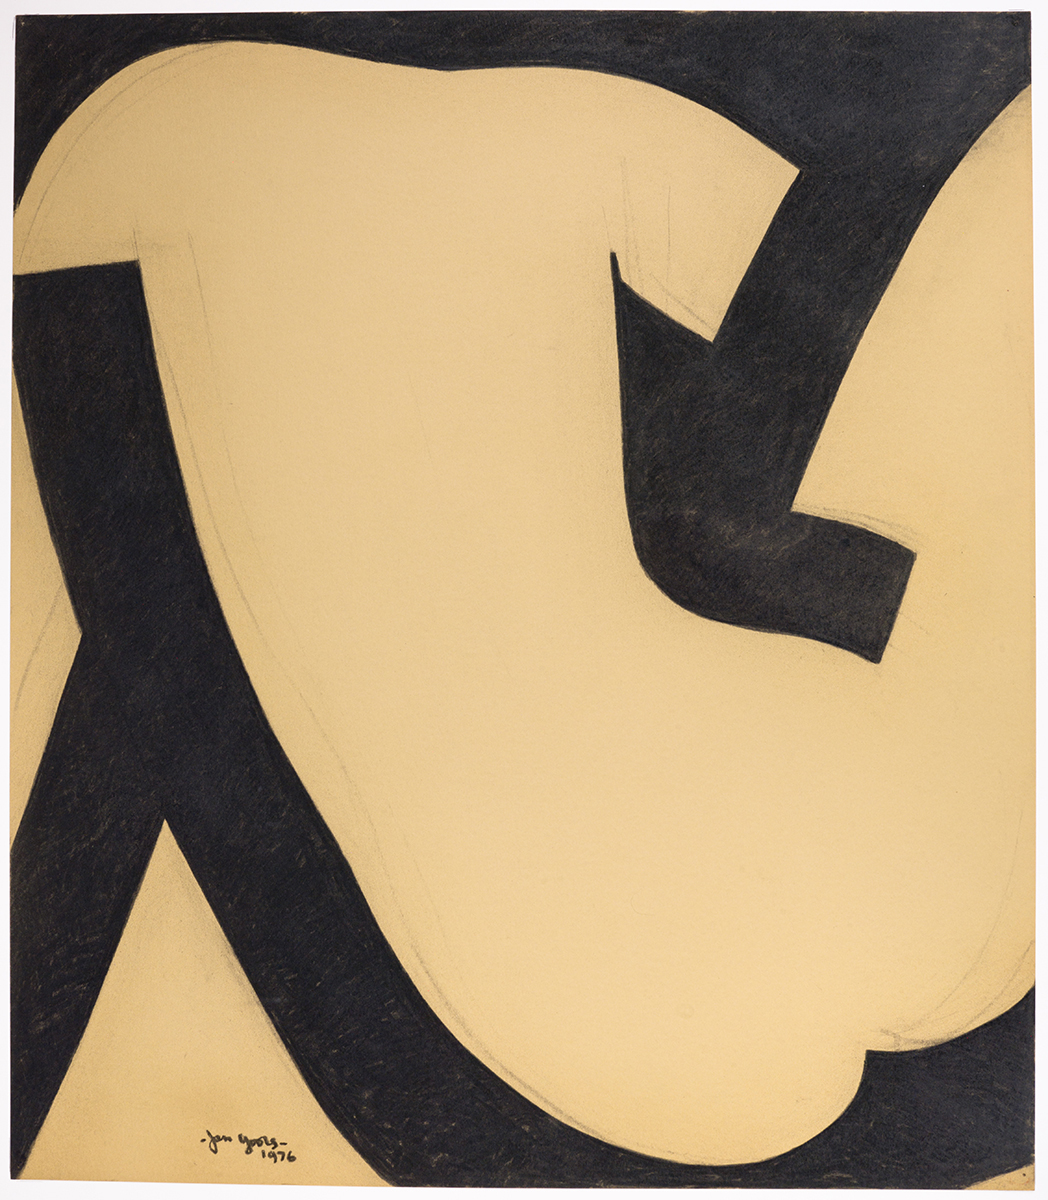 Nude (G-62.31), 1976